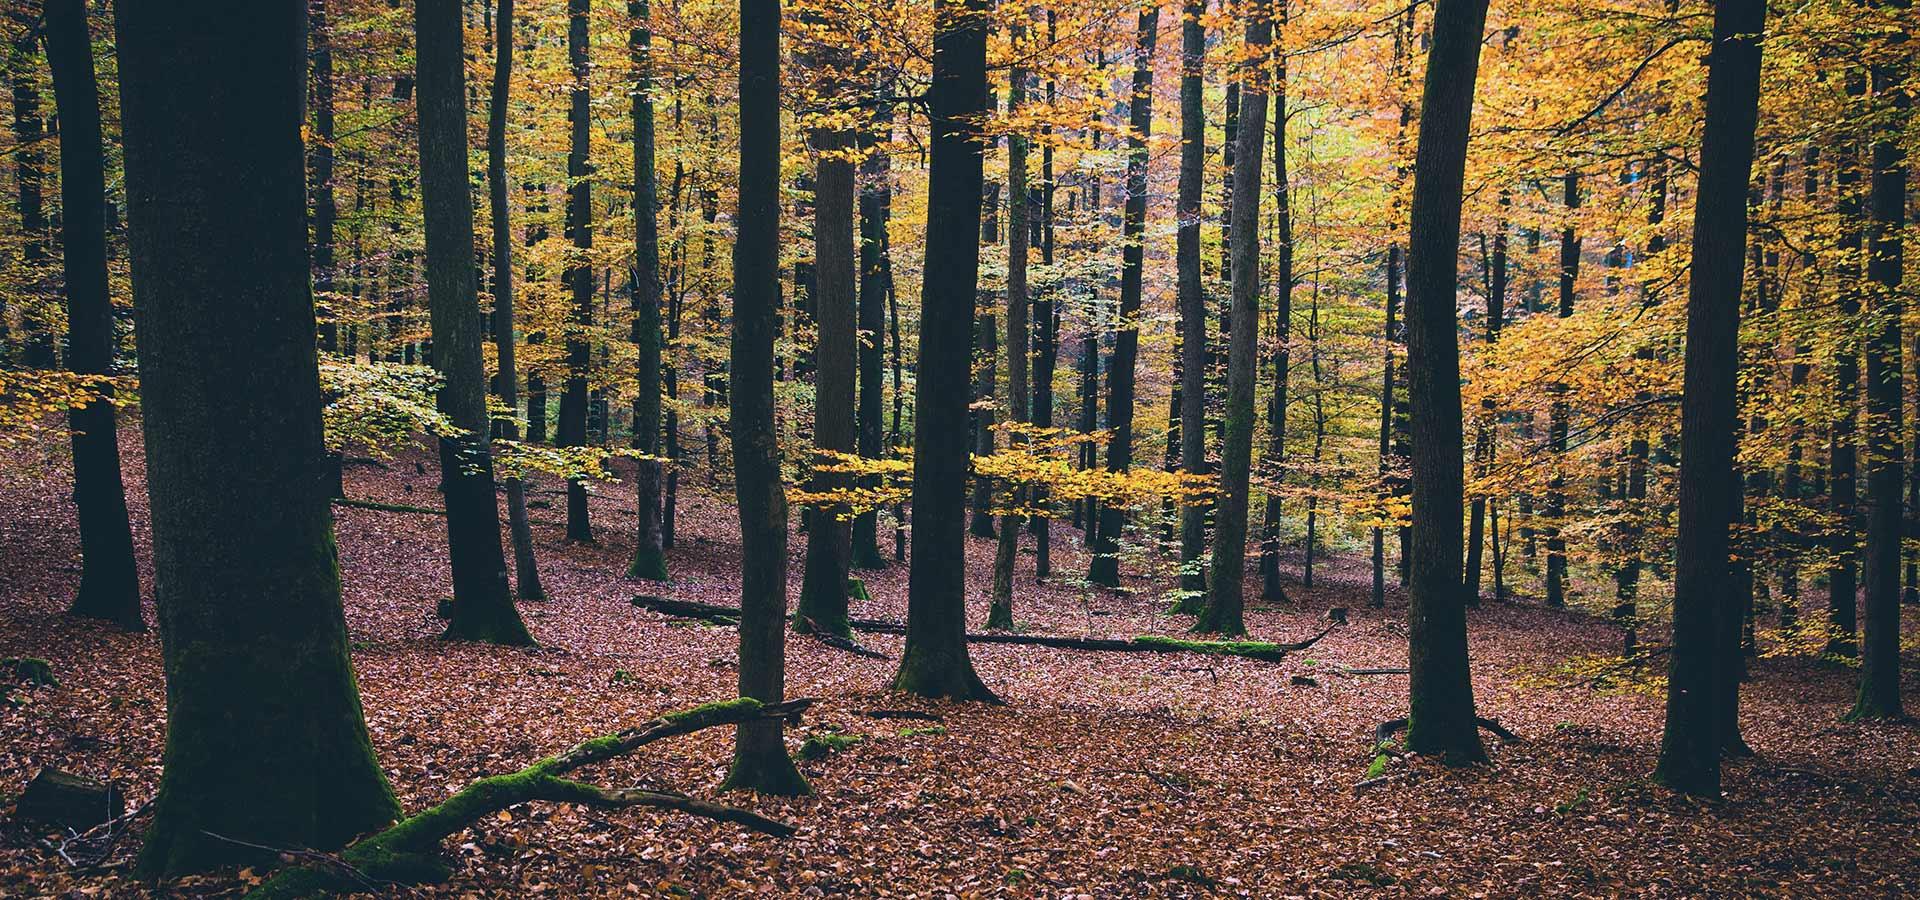 optimization-wood-resources-4